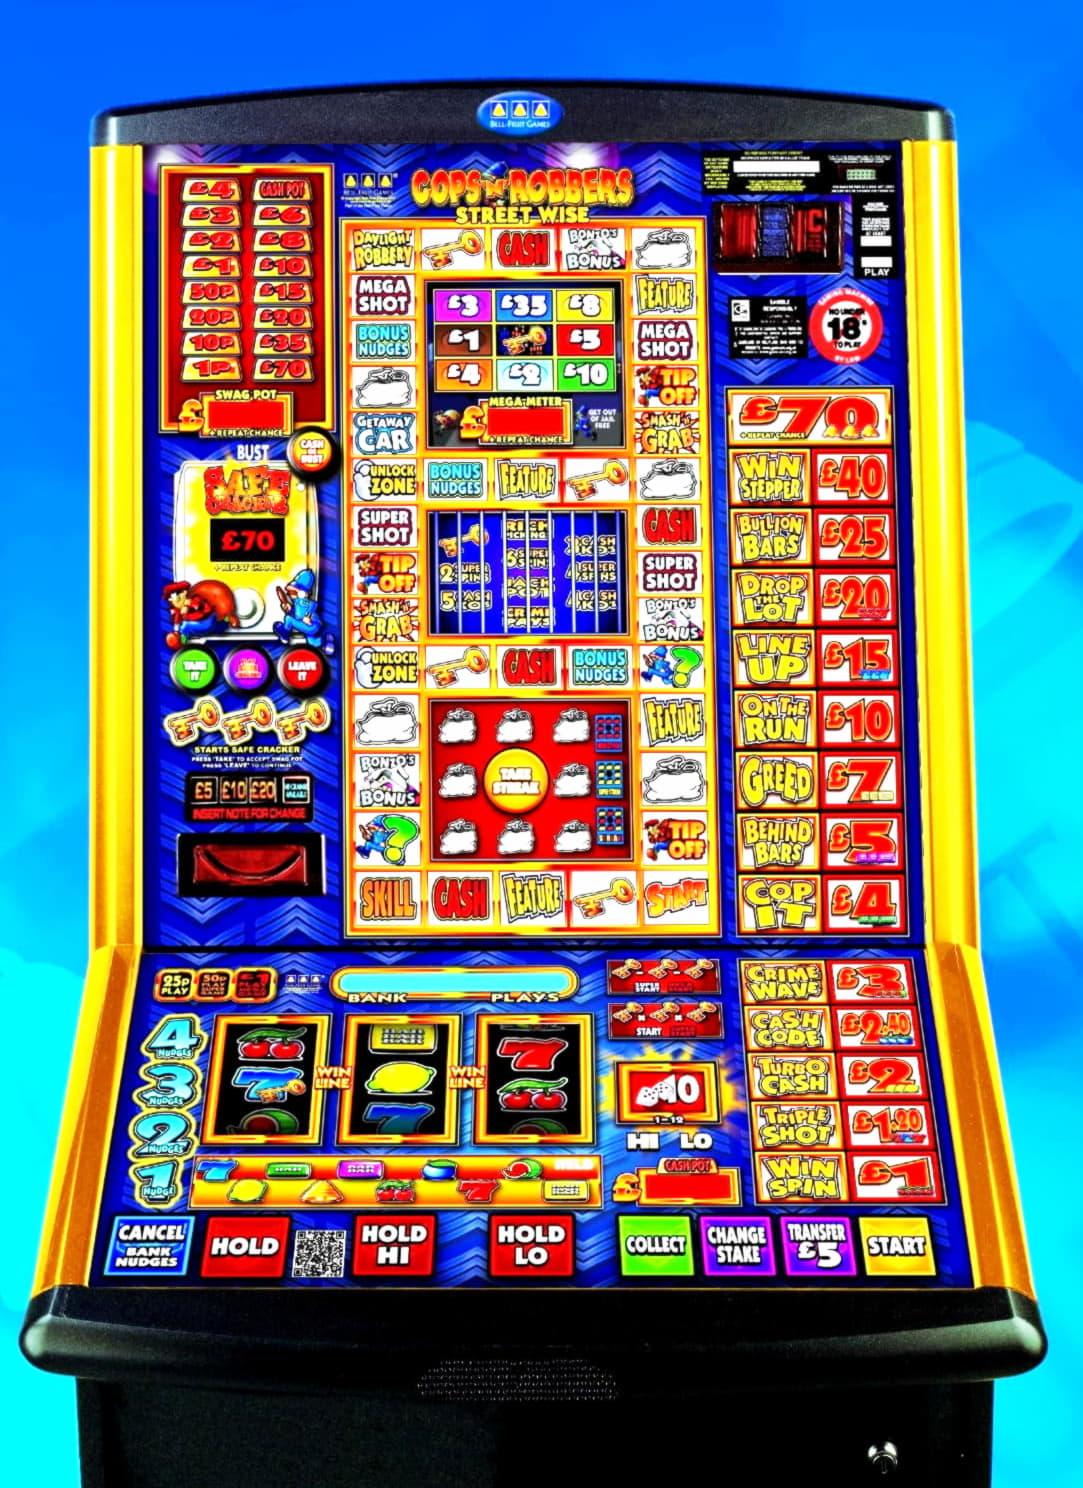 $ 755 Turnamén Kasino gratis di Manhattan slot Kasino